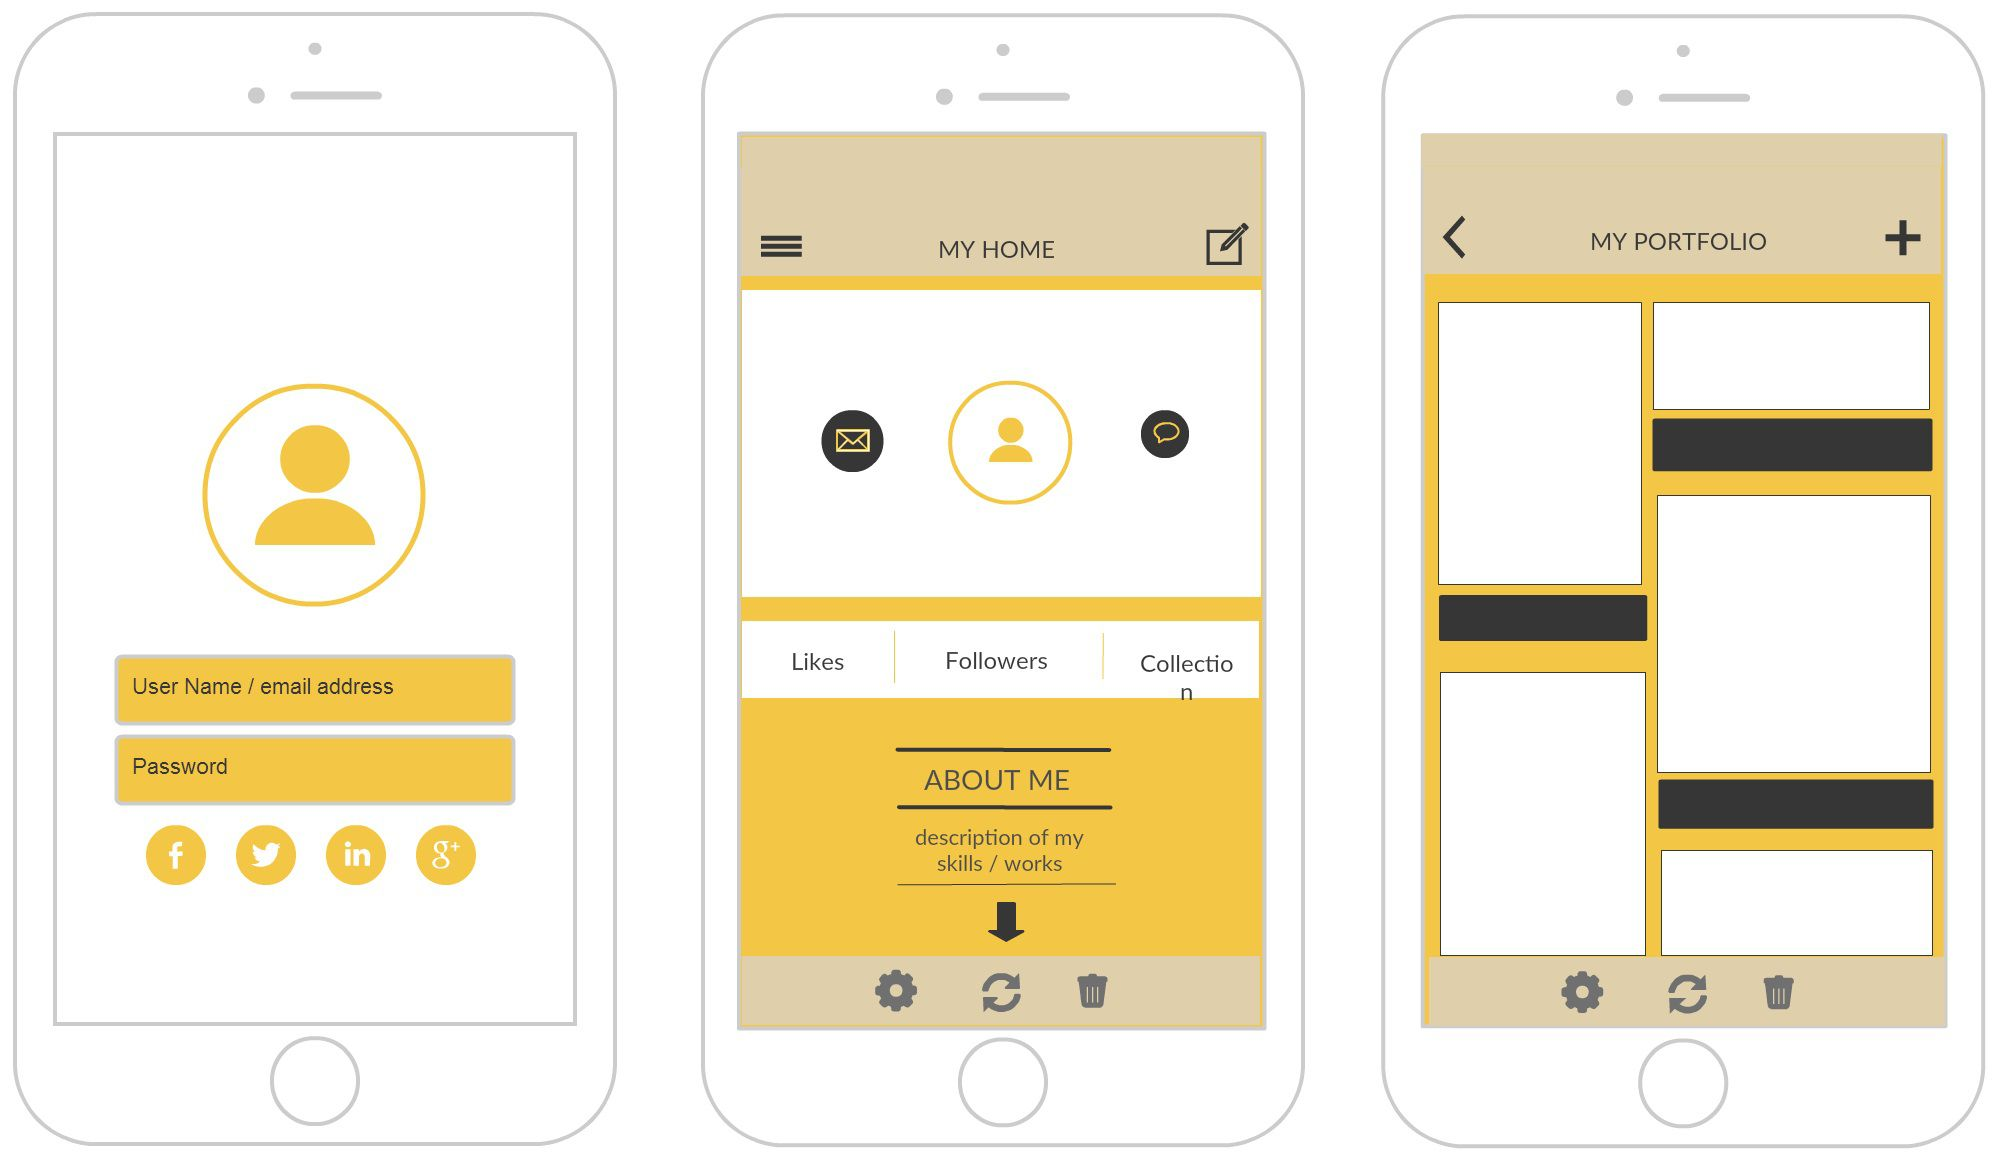 006 Stunning Iphone App Design Template Inspiration  Templates Io Sketch Psd Free DownloadFull